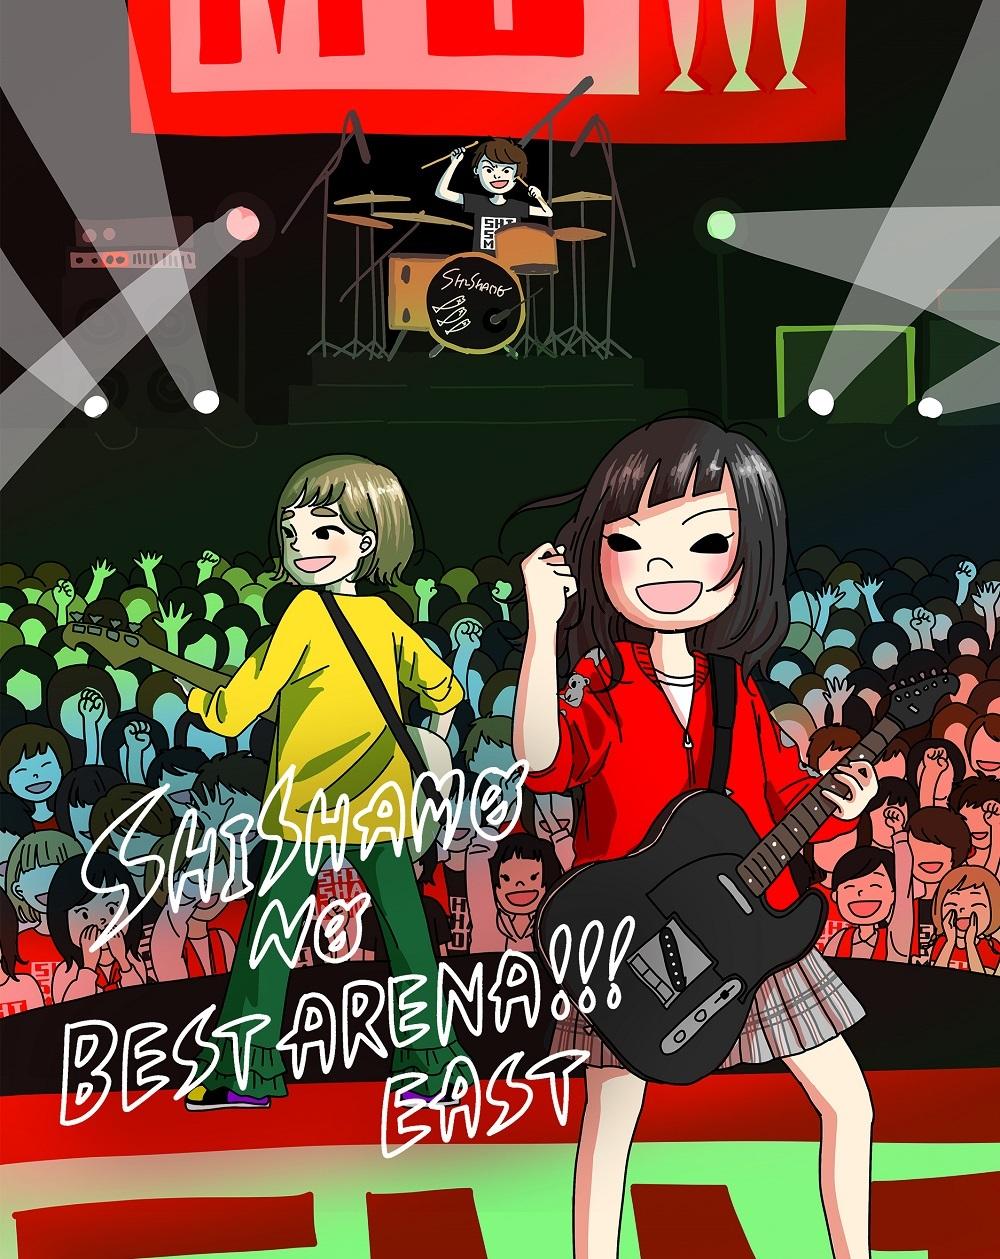 Blu-ray Disc『SHISHAMO NO BEST ARENA!!! EAST』